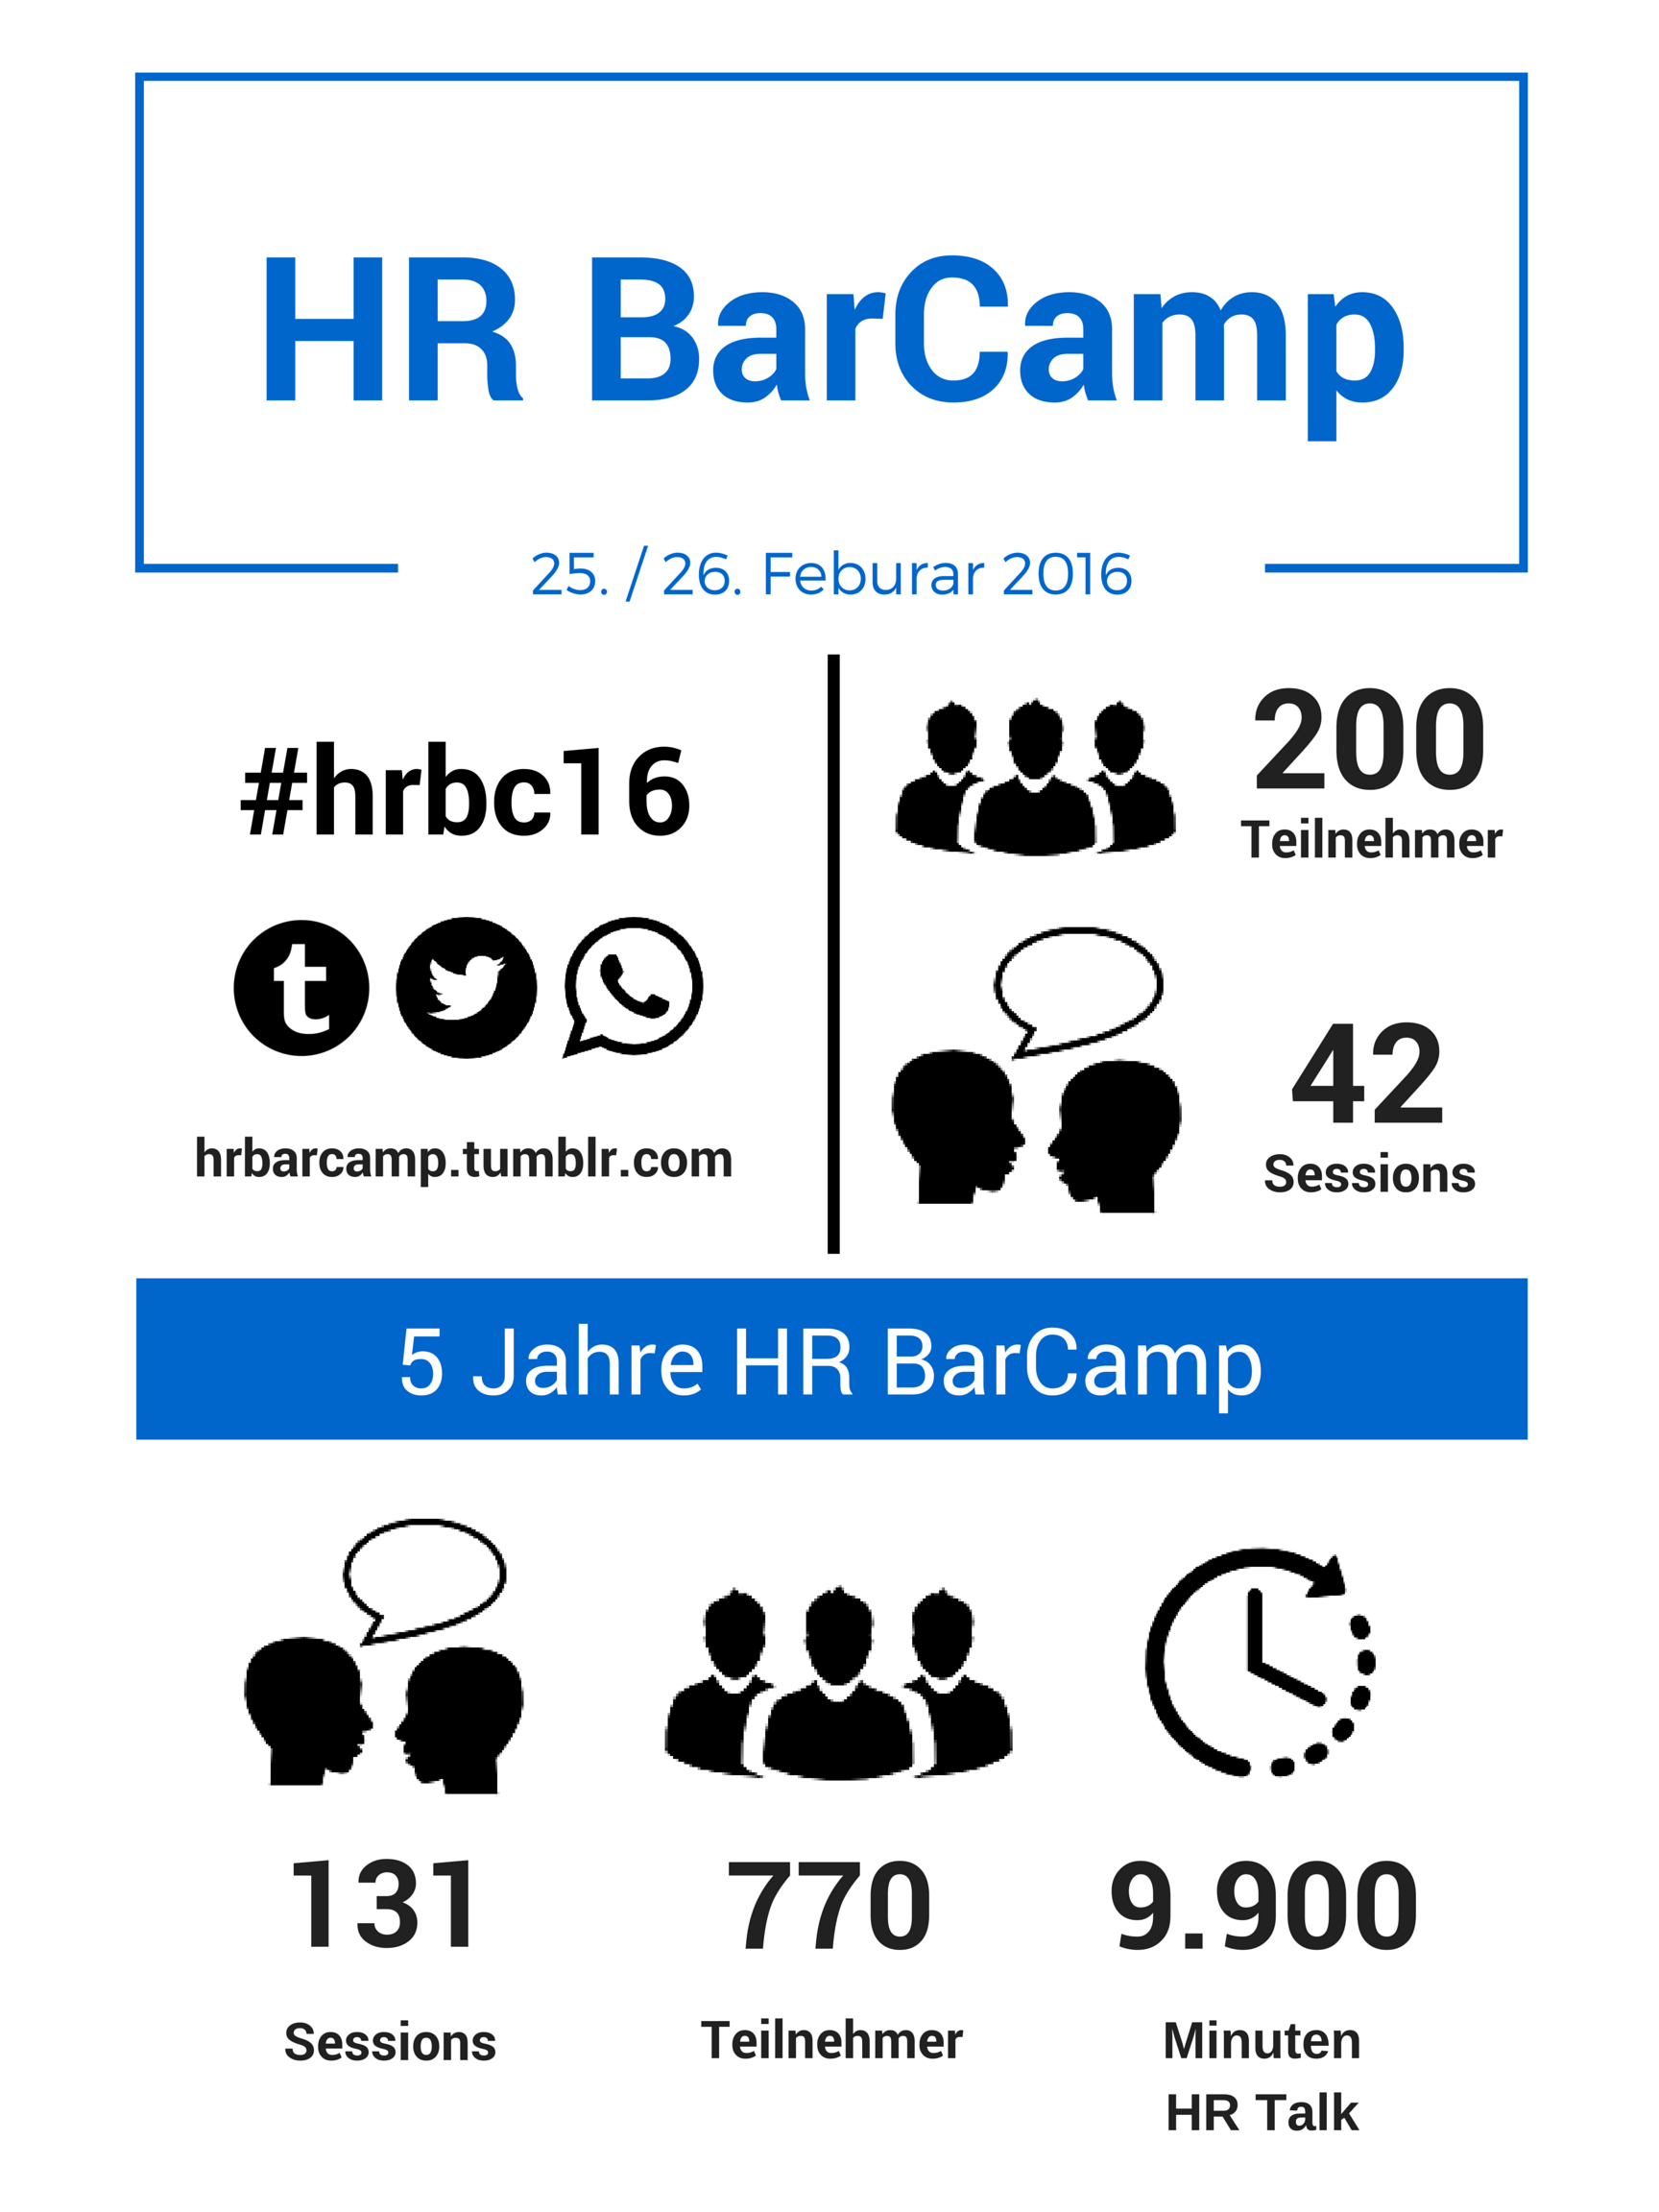 hr barcamp 2016 infografik